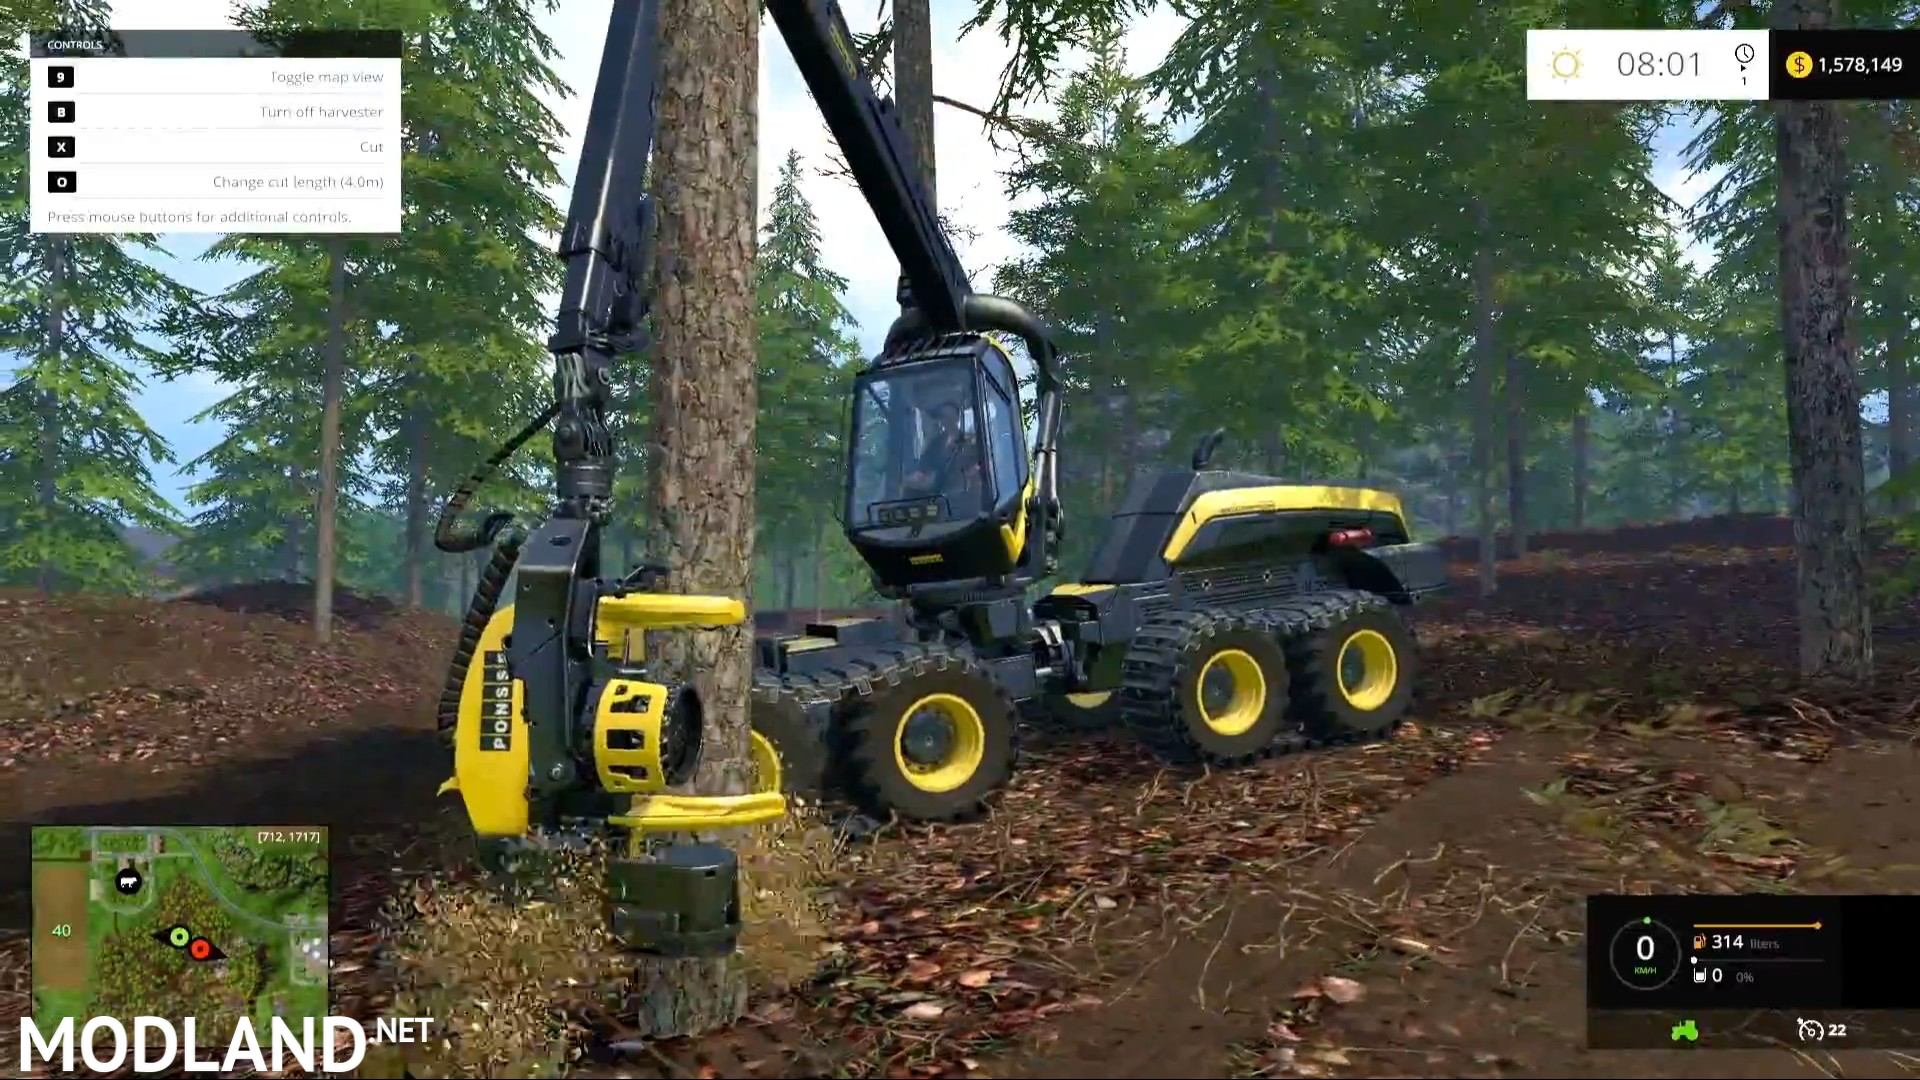 Farming Simulator 2015 - Gameplay Teaser 3 mod for Farming Simulator